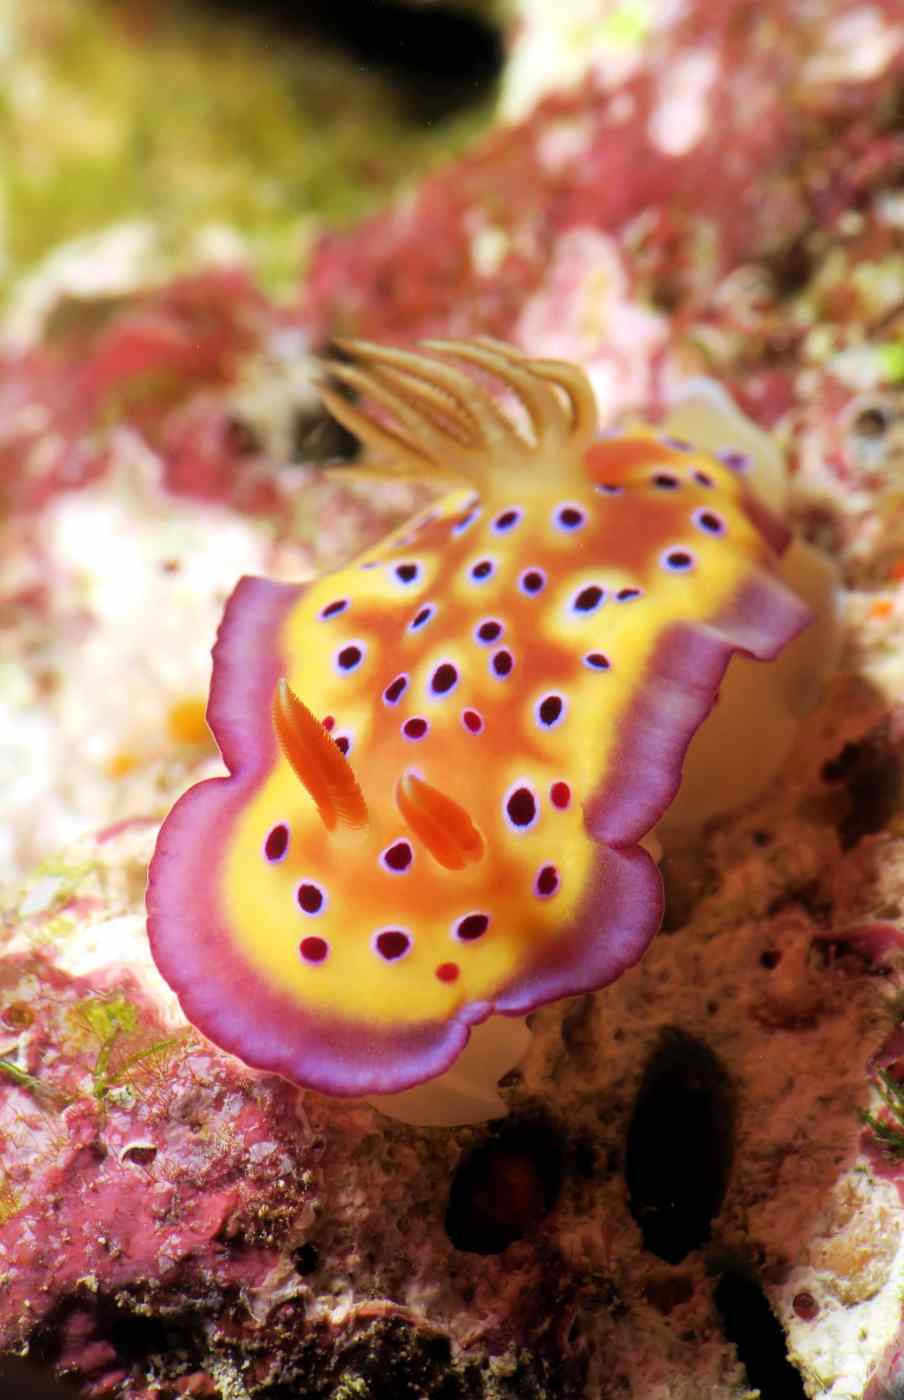 Chromodoris Kuniei nudibranch scuba diving Isleof Pines New Caledonia